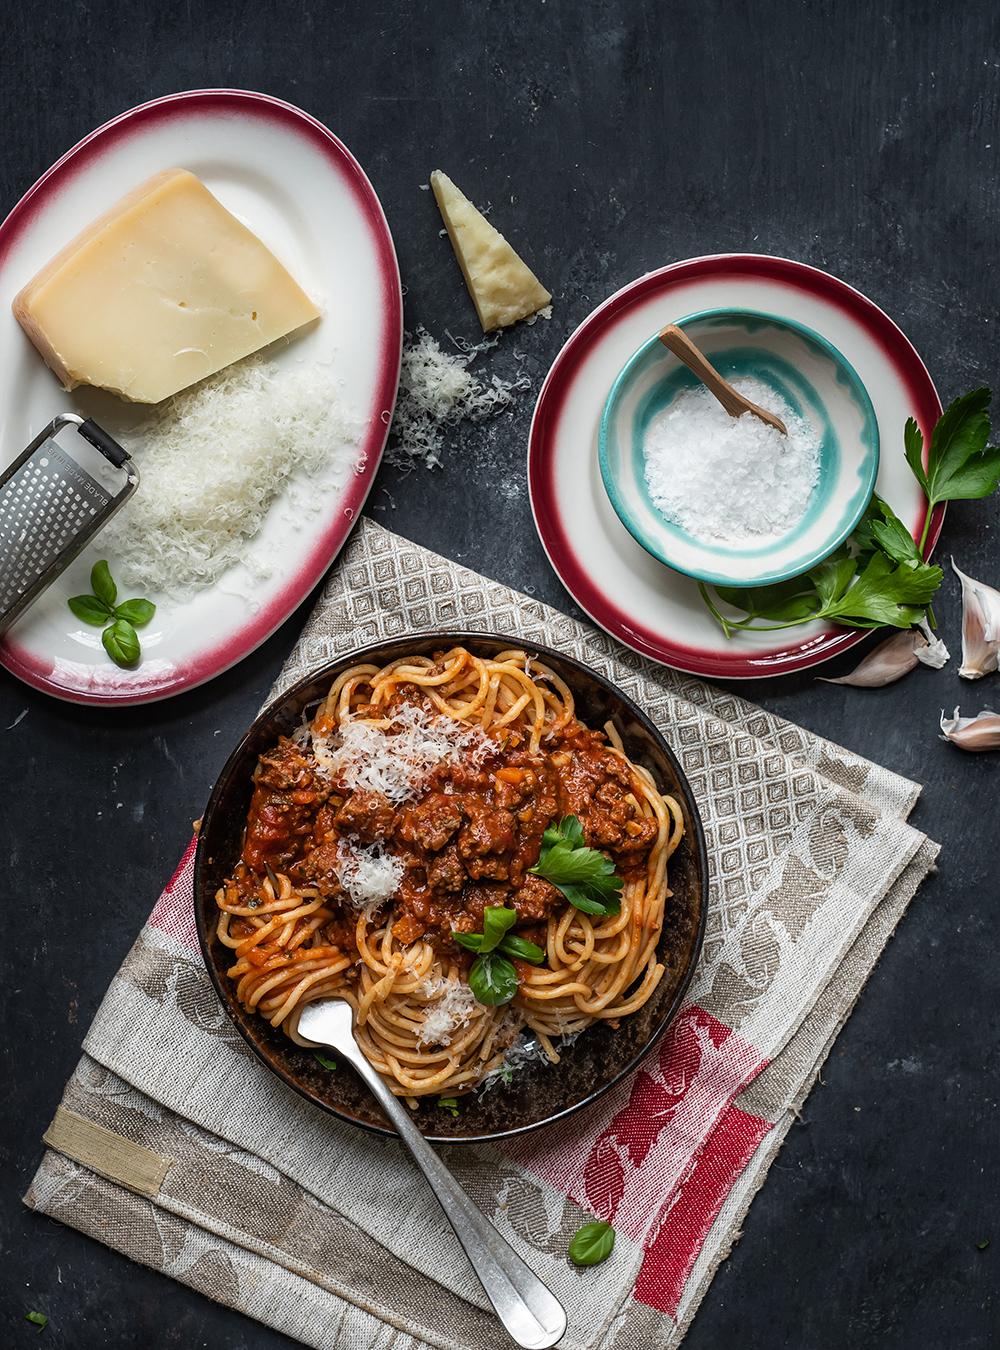 Spaghetti Bolognese, meine ultimative Version des schnellen Klassikers - 7 Tage - 7 geniale Rezepte für Spaghetti mit Tomatensauce